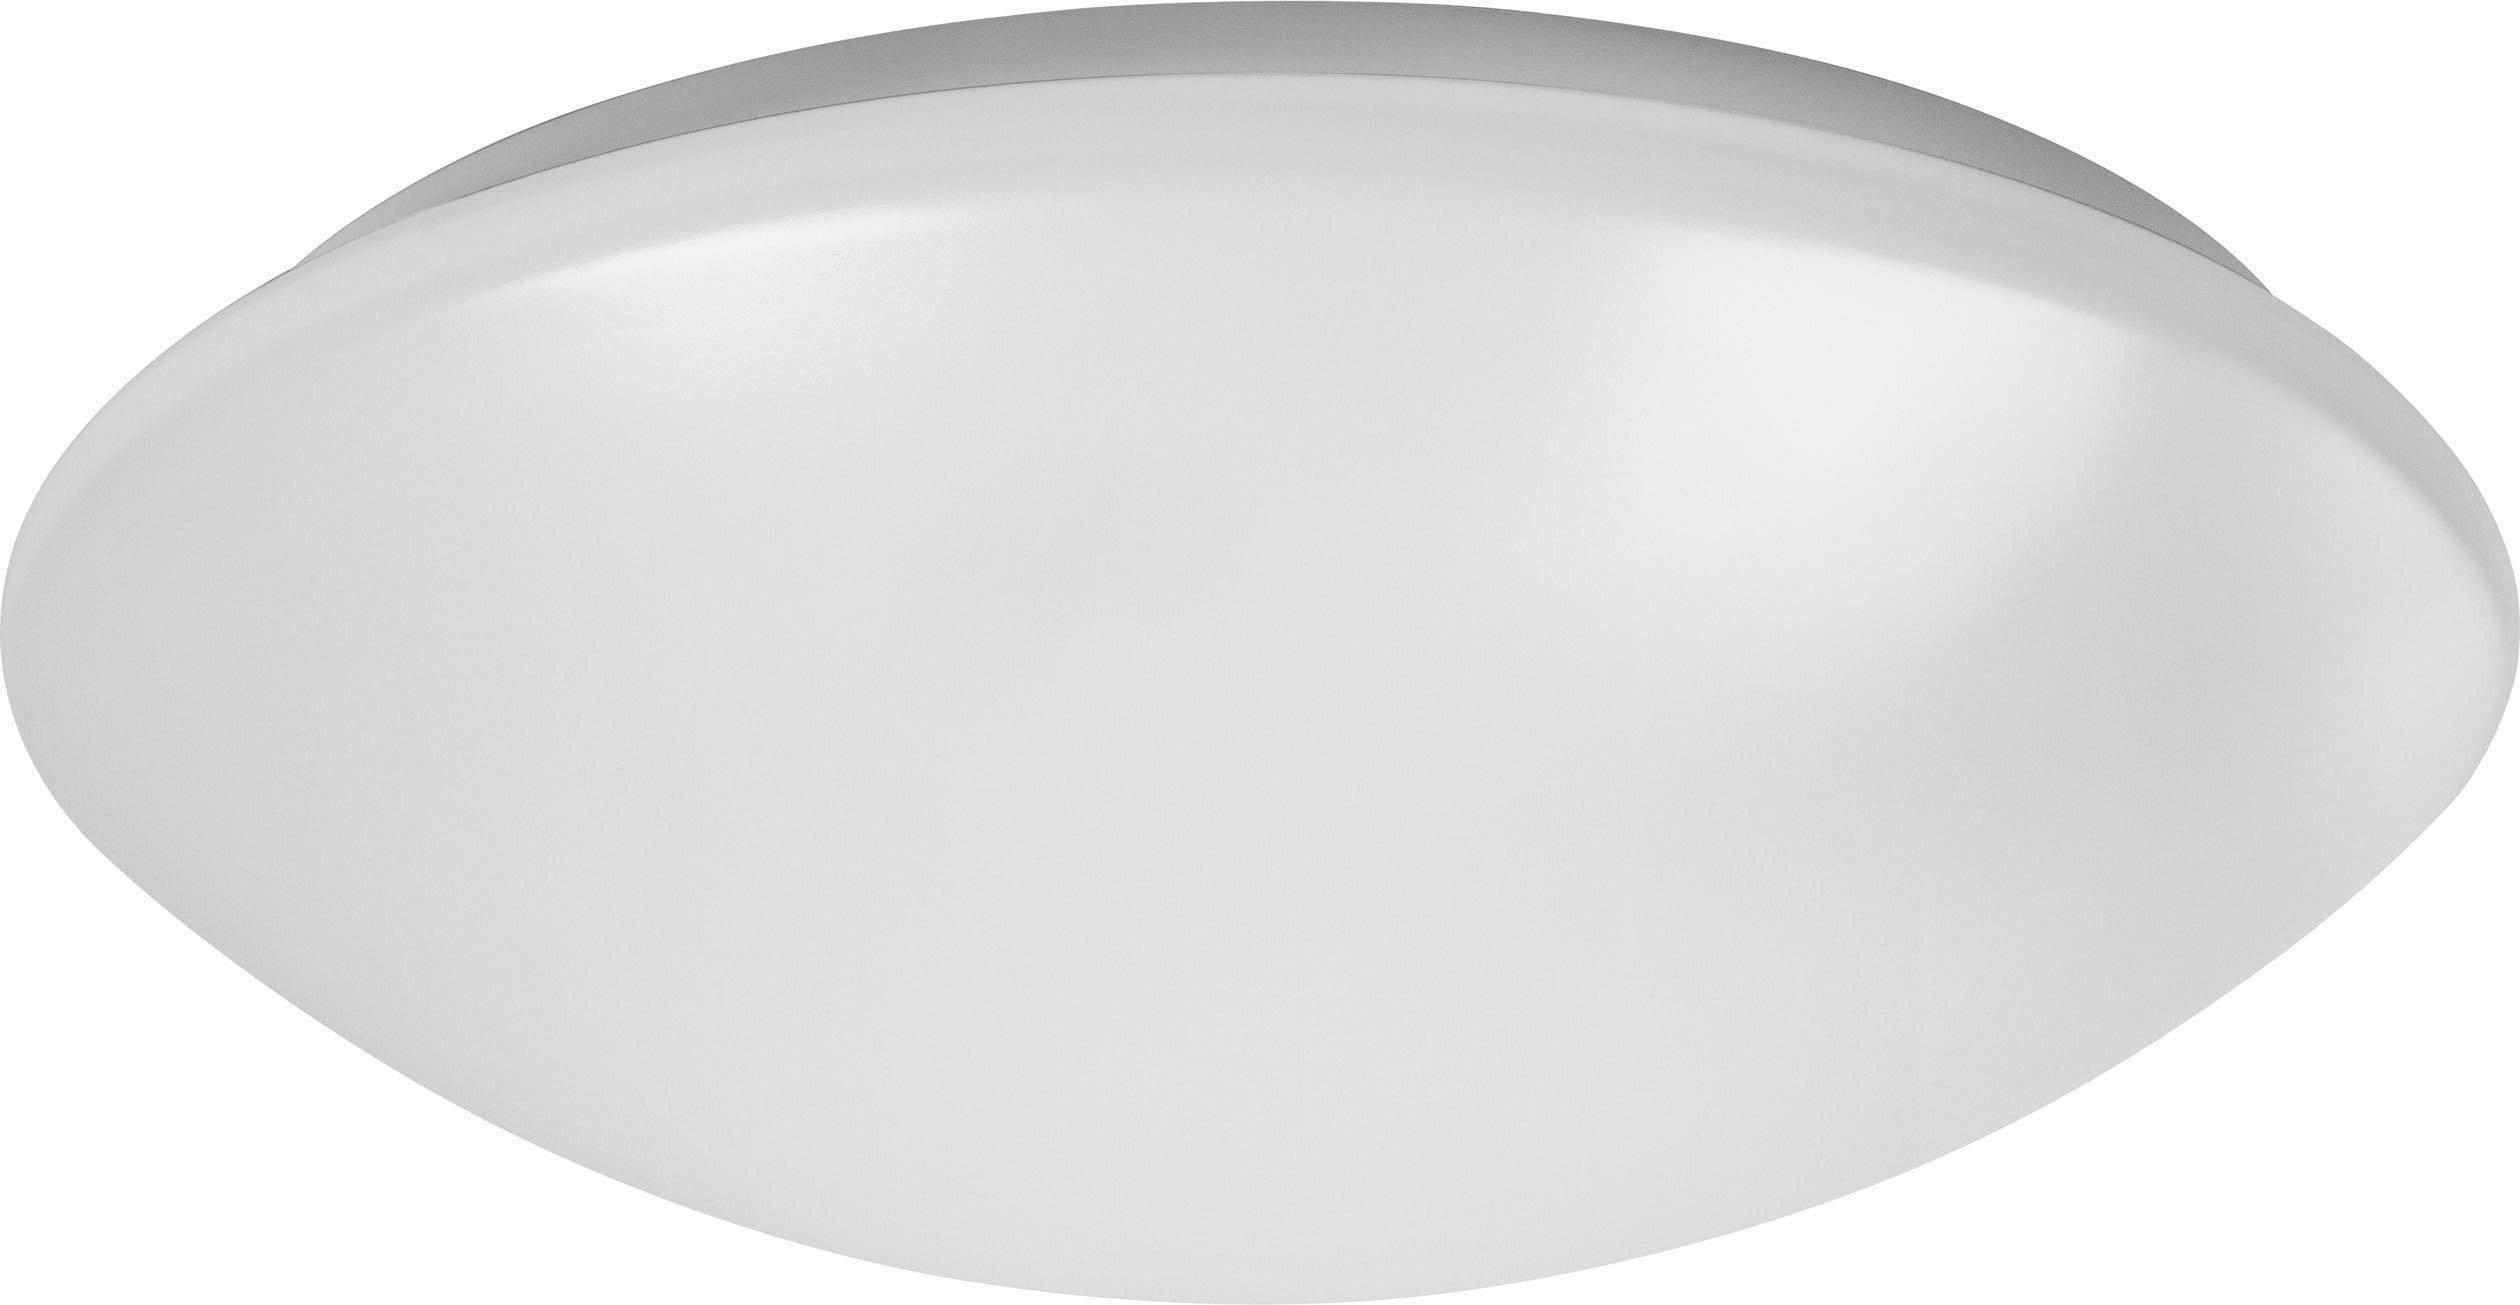 Ledvance Surface Circular 400 Sensor 4058075080096 Led Outdoor Wall Light Motion Detector 24 W White Conrad Com